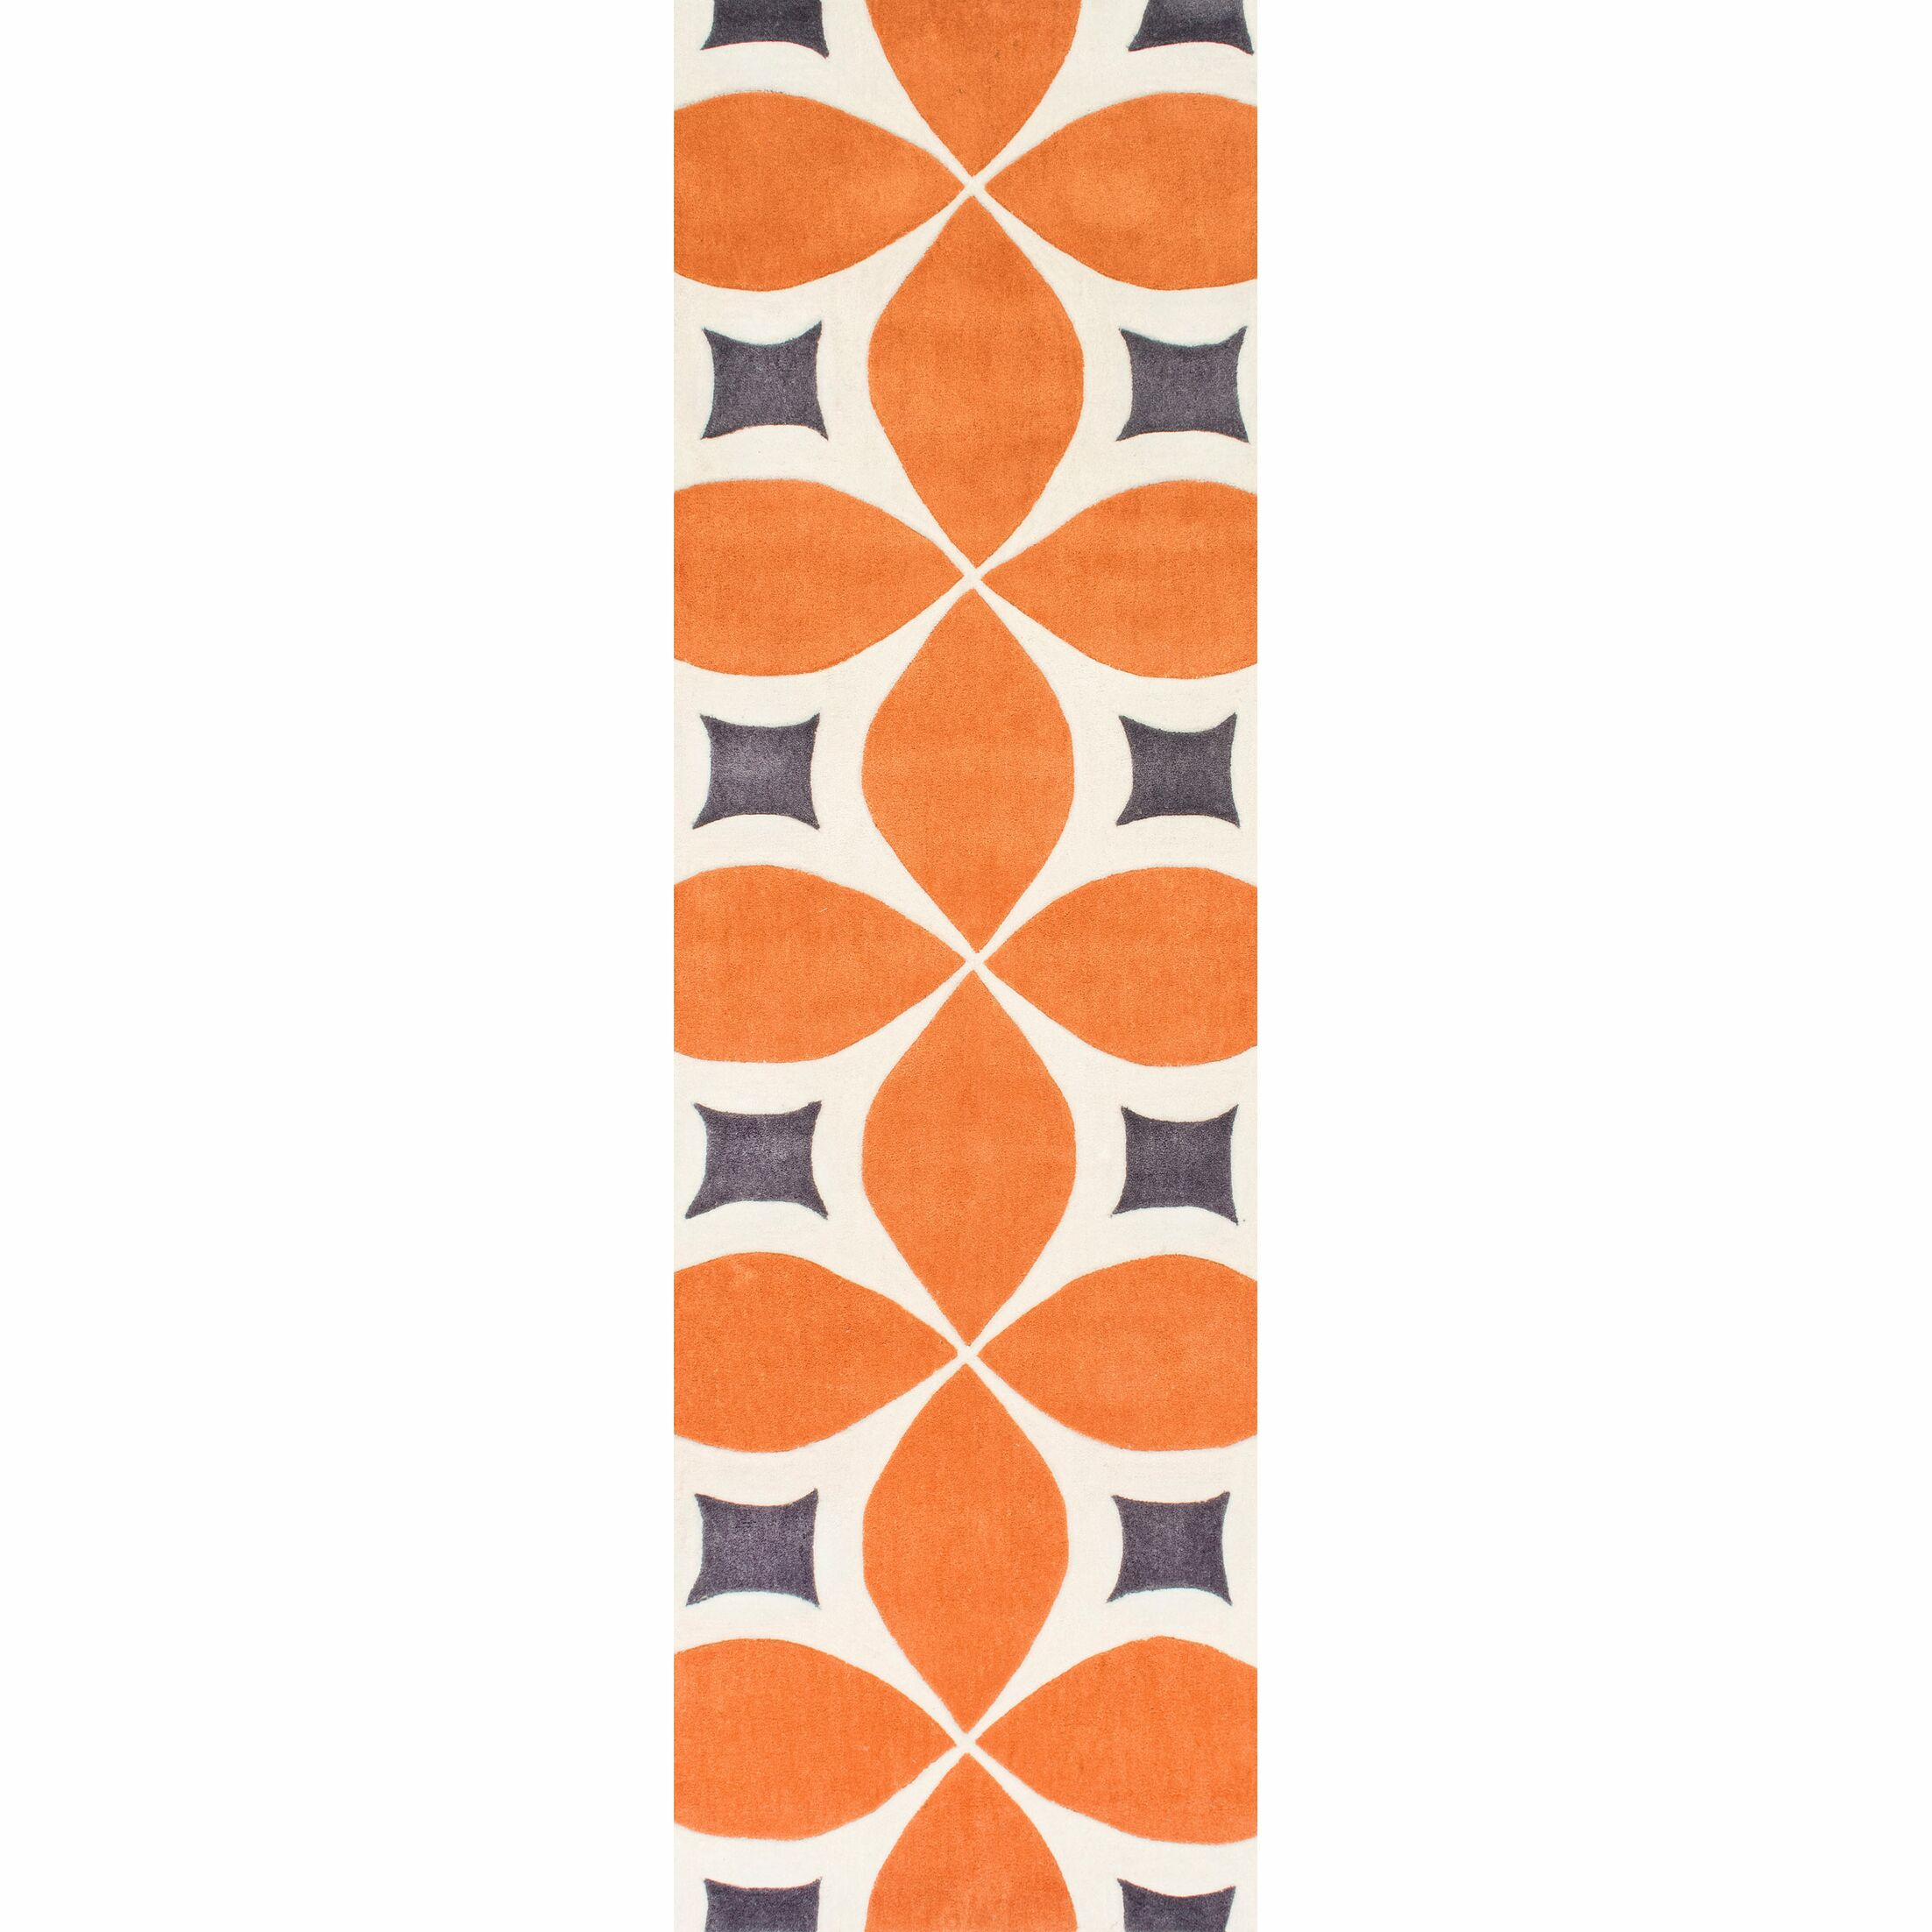 Sorrento Hand Woven Orange Area Rug Rug Size: Runner 2'6